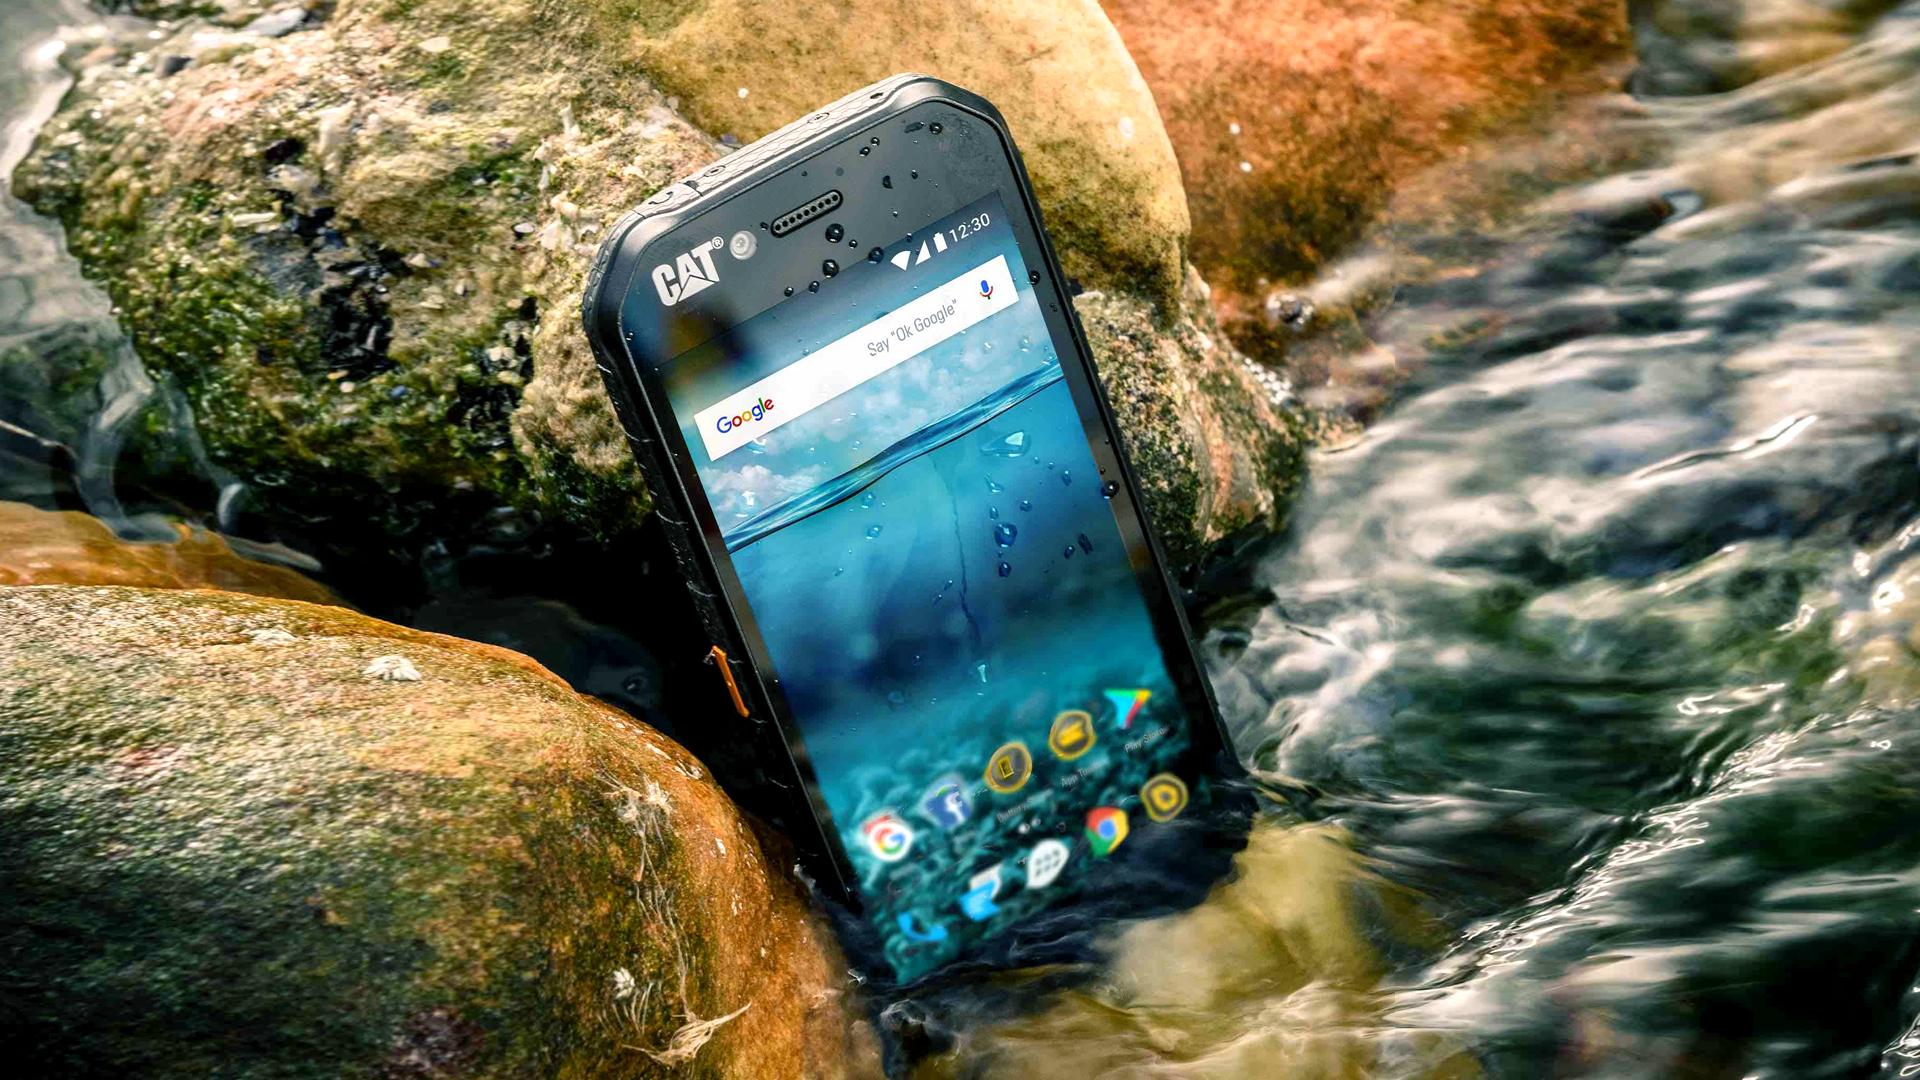 Caterpillar S41 Rugged Smartphone